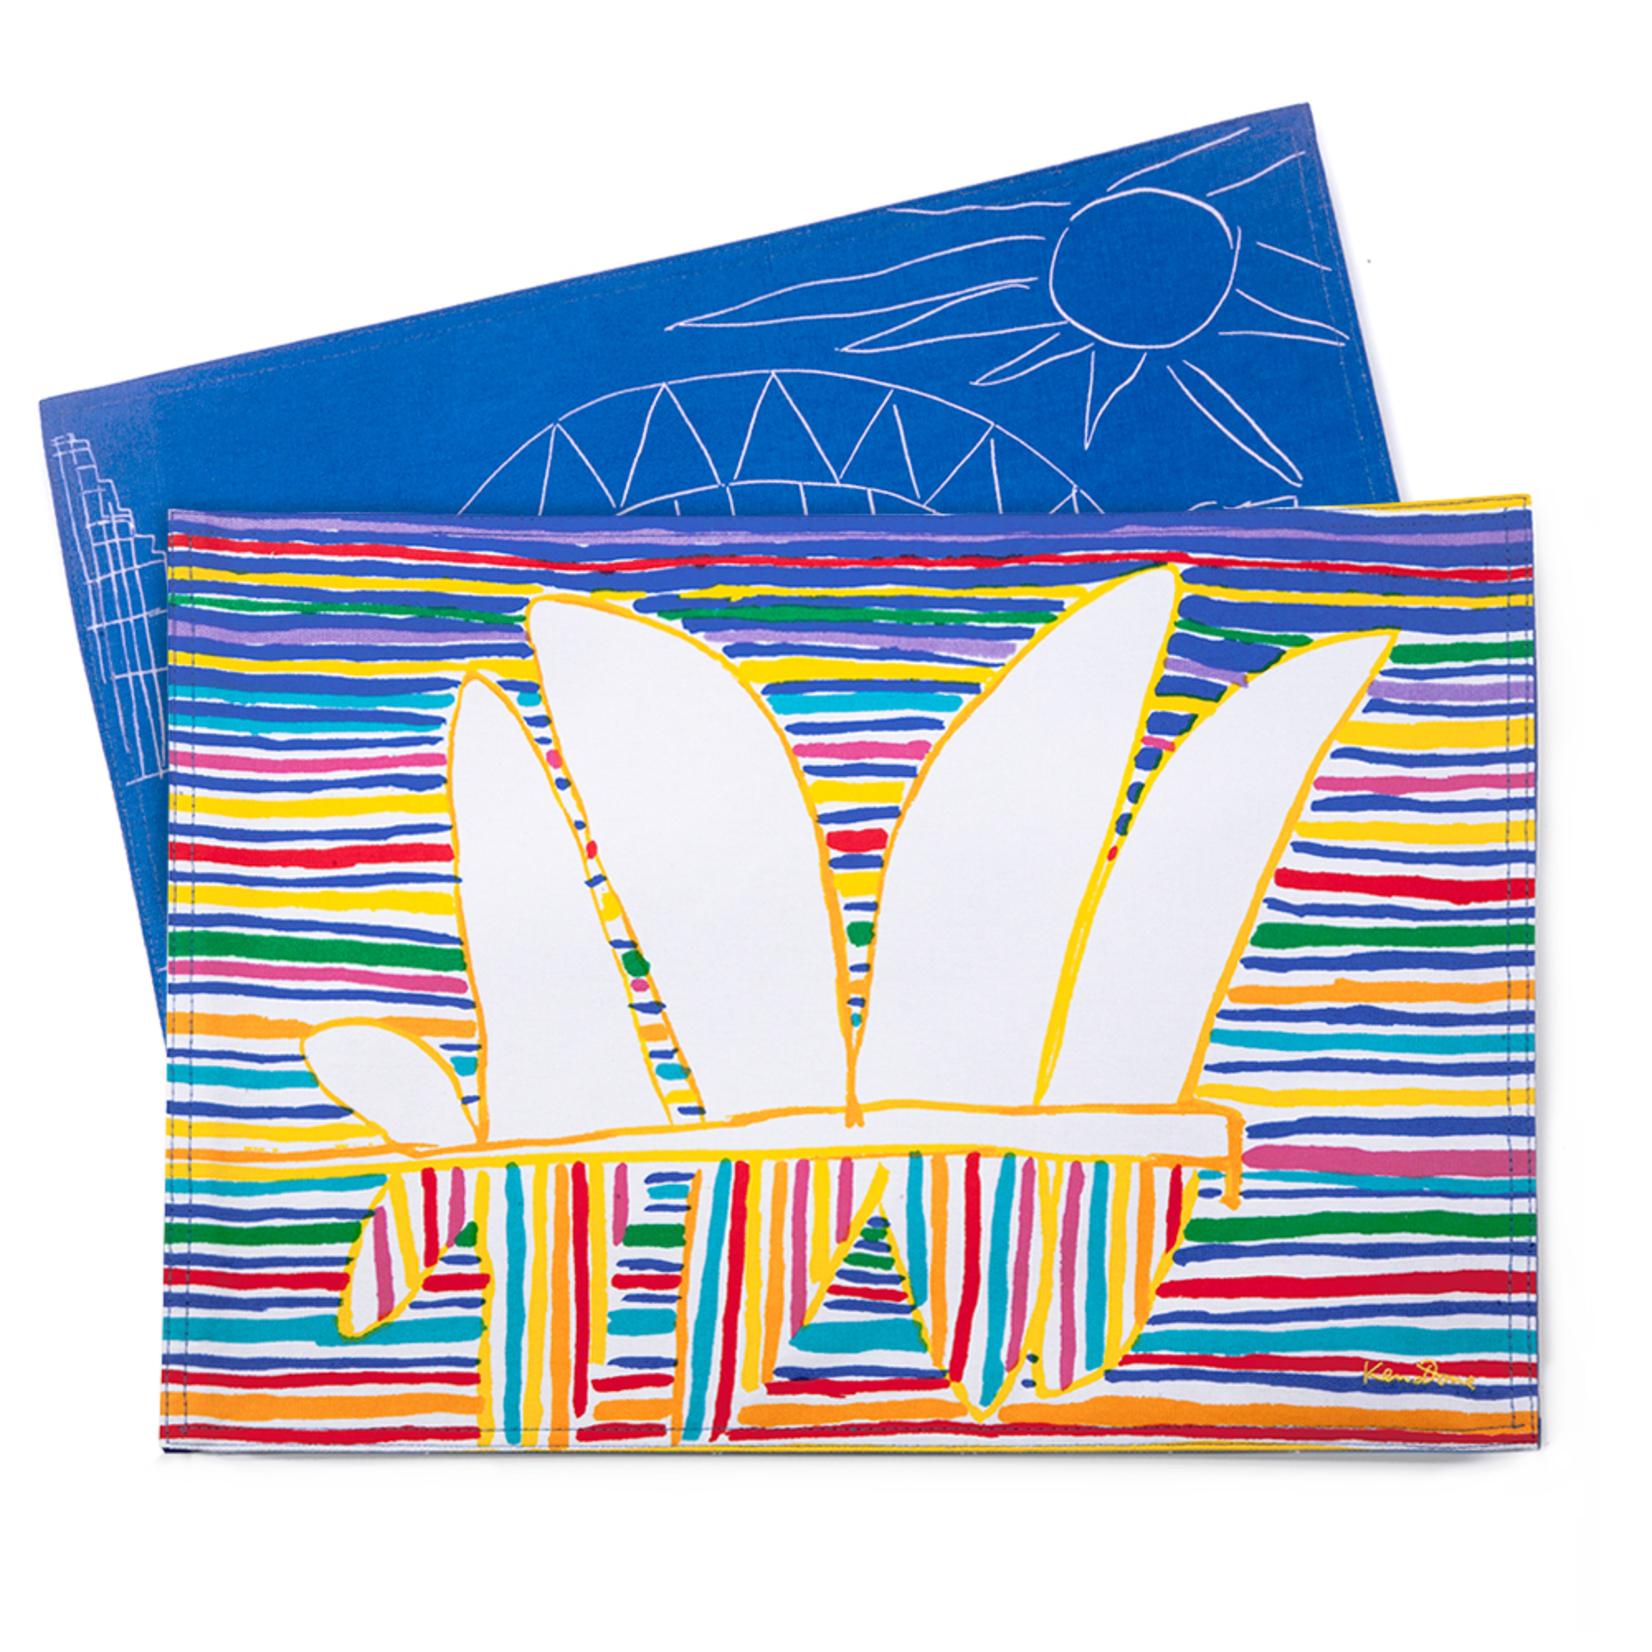 Homewares Placemats set of 2 - Sydney Striped Sea Blue